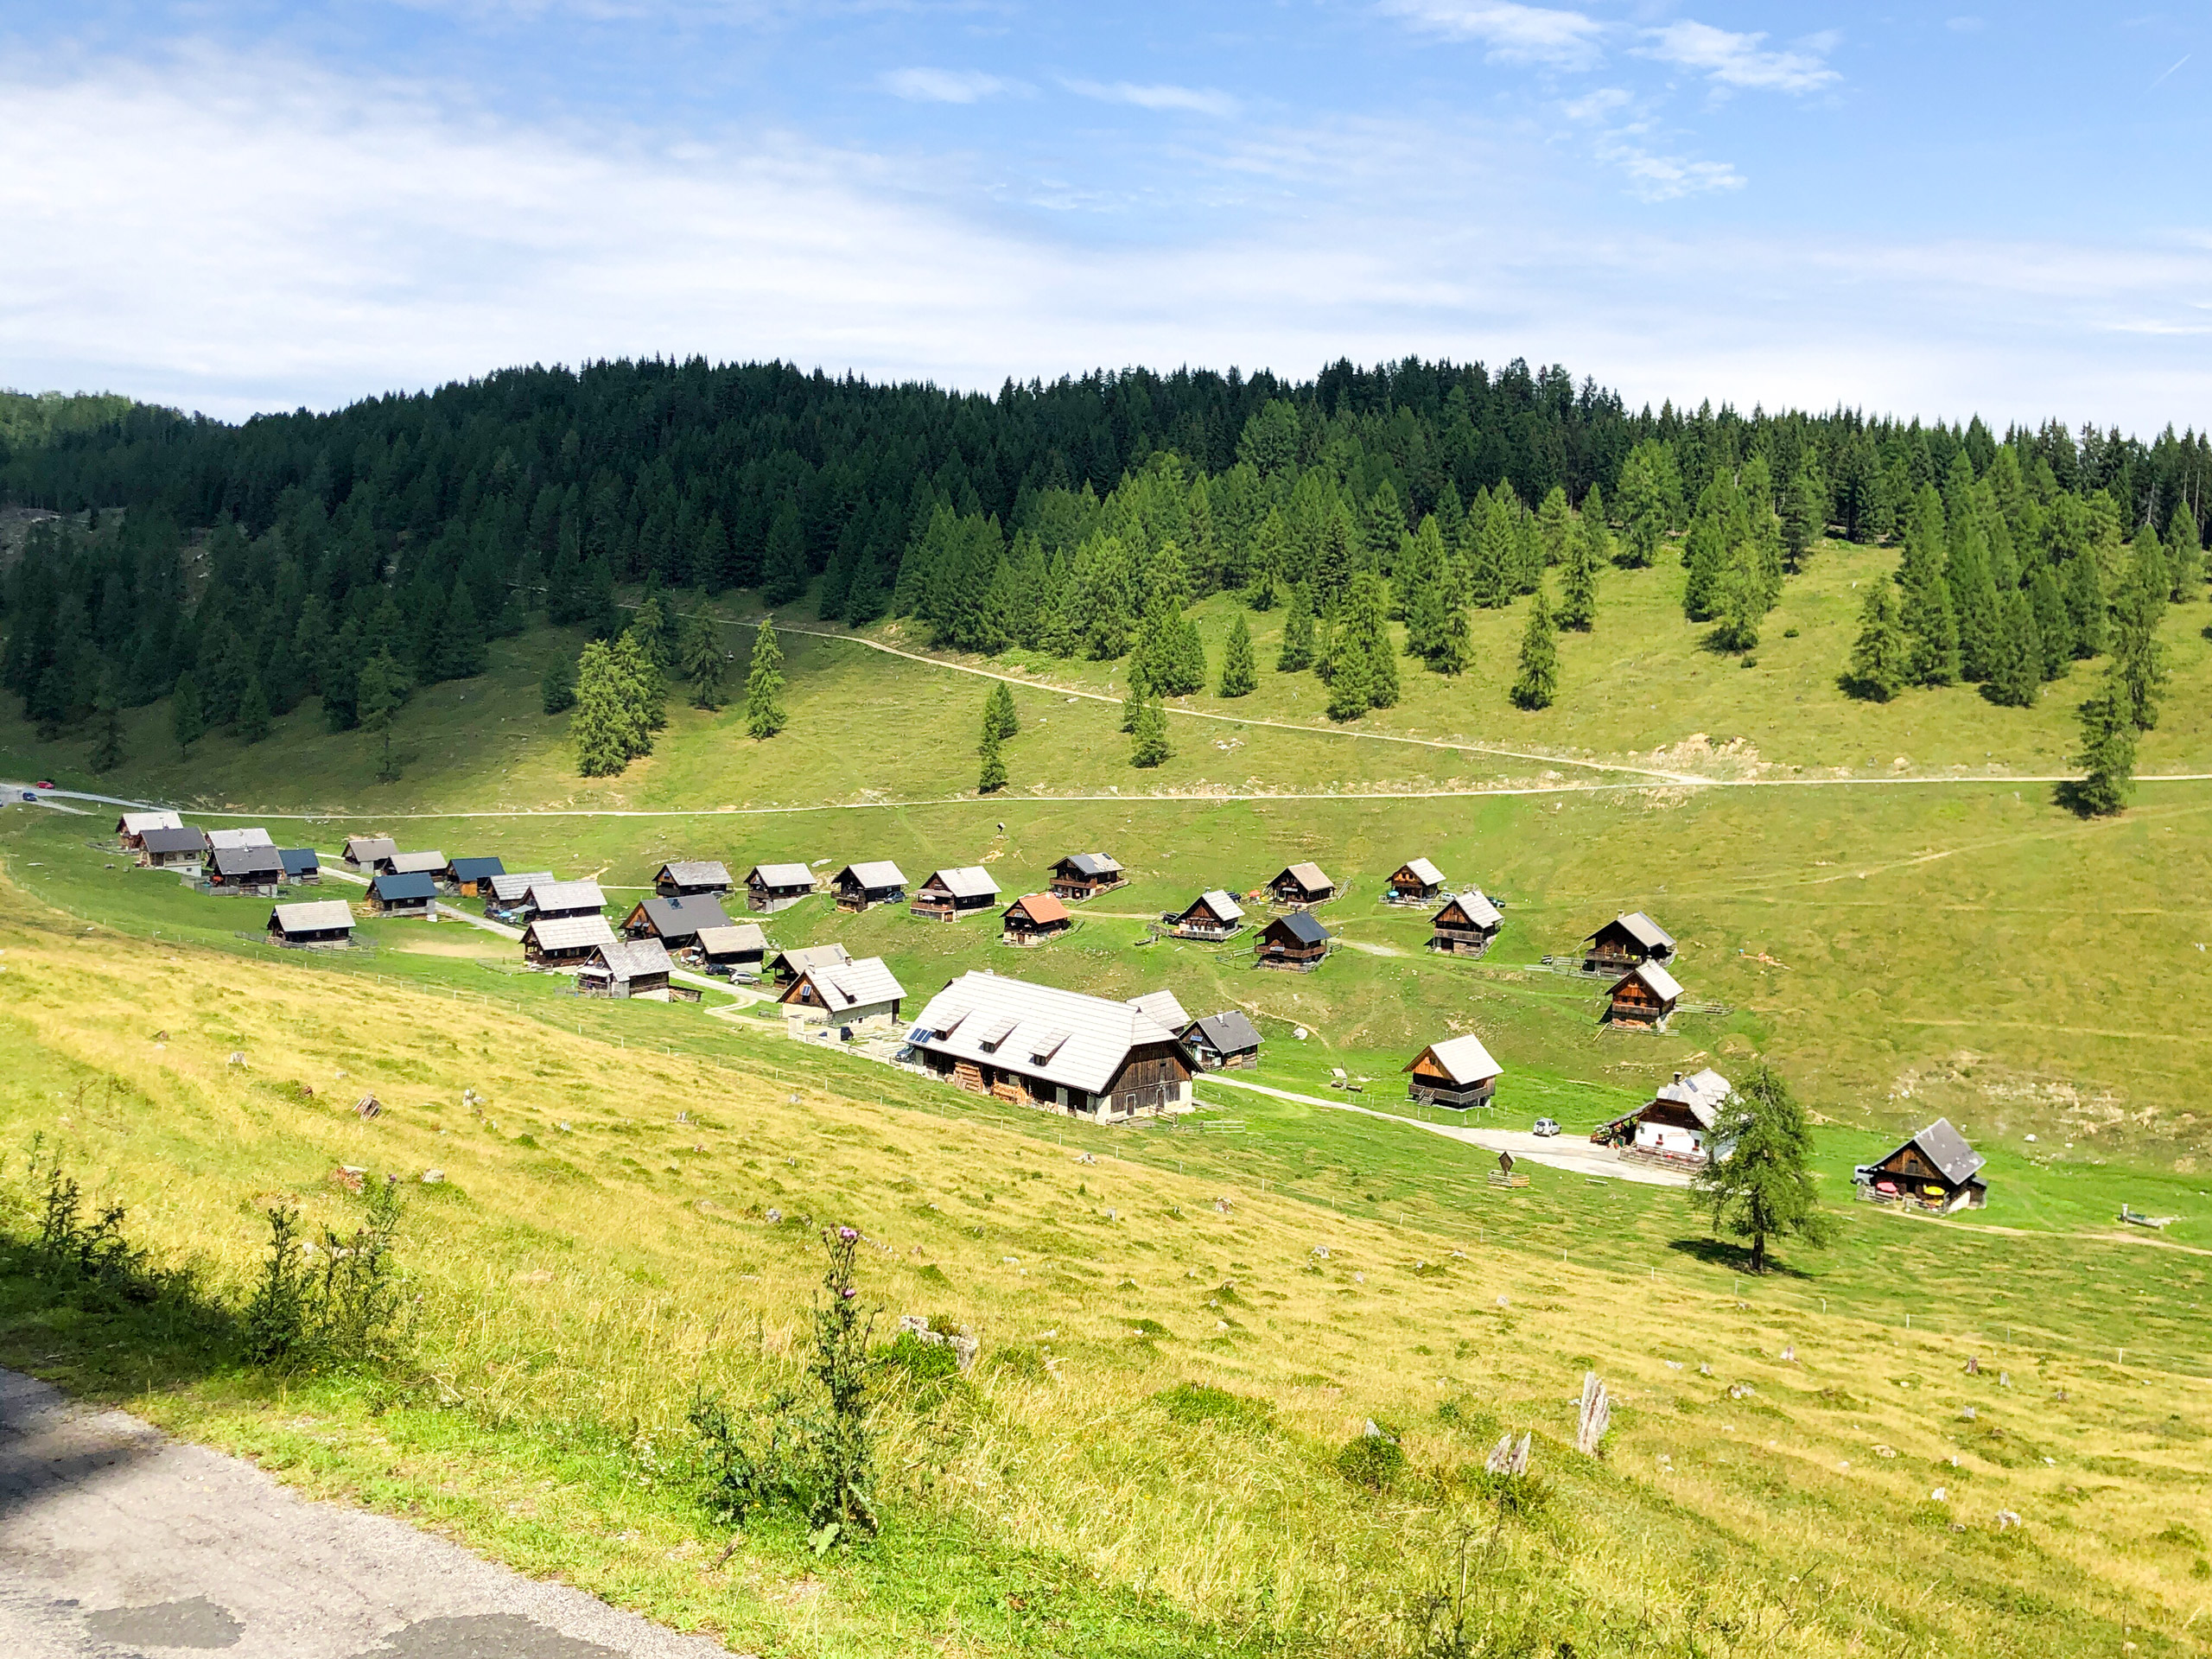 Mountain village in Italy